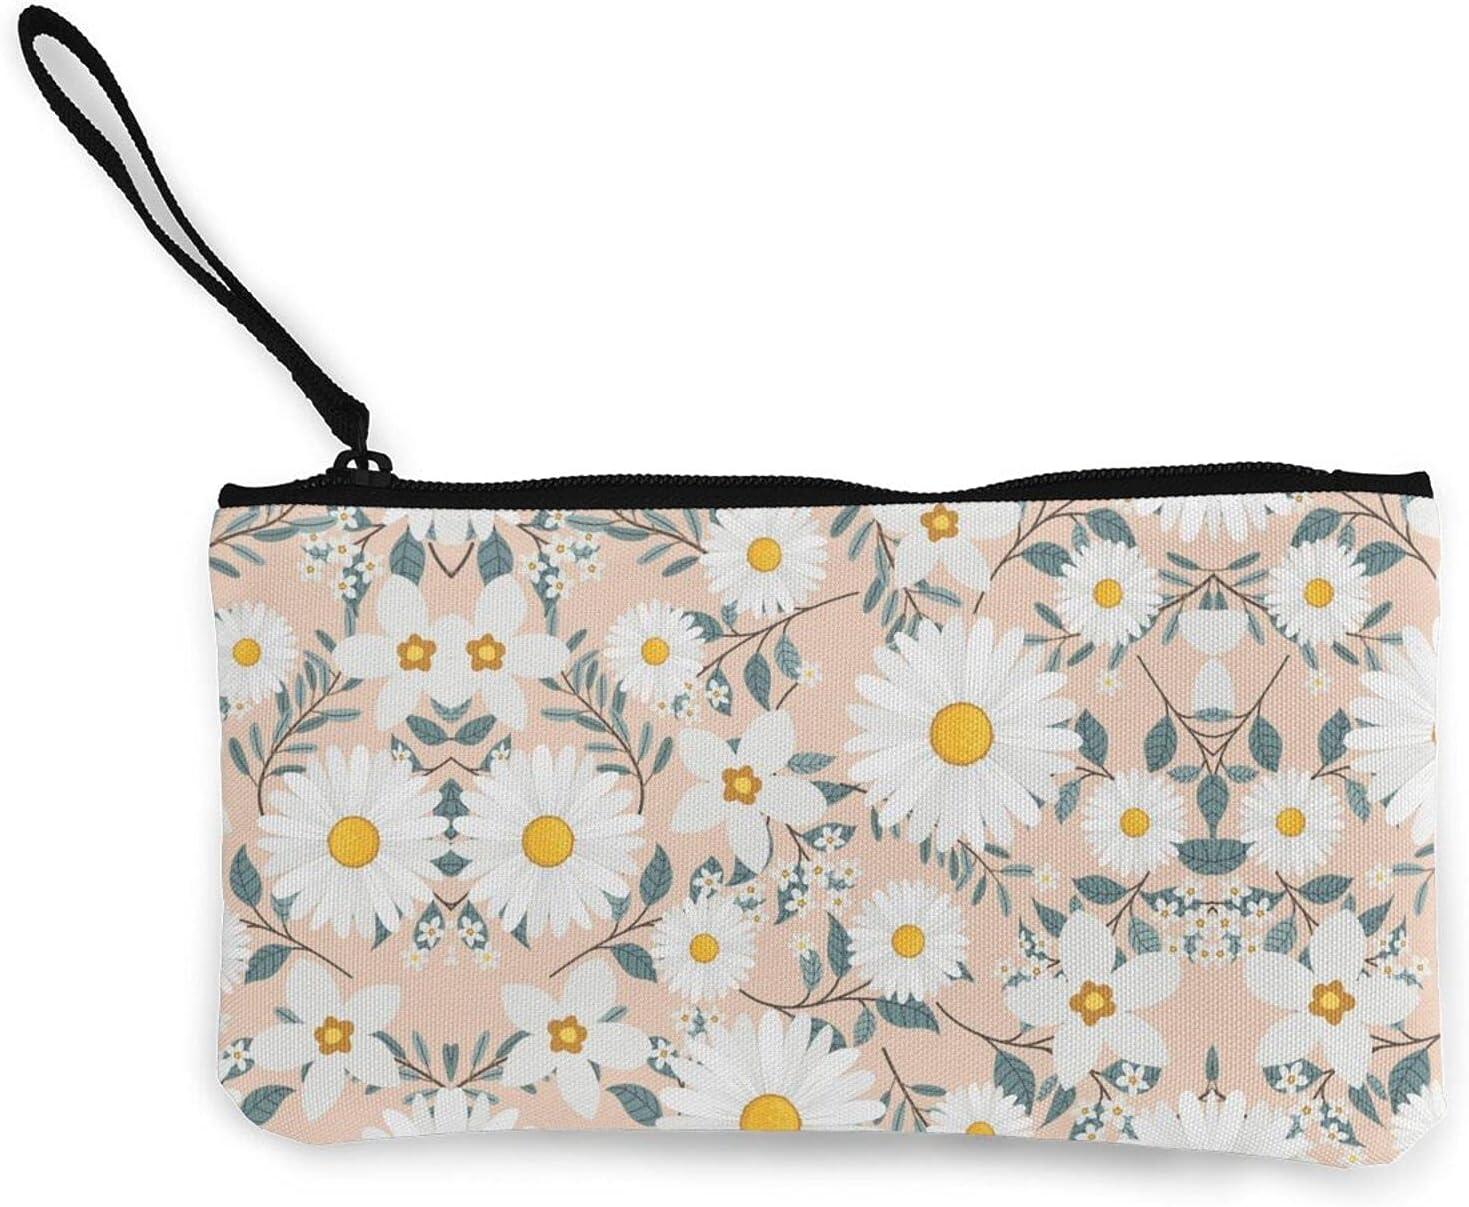 Cute Peach And White Floral Daisy Zipper Pouch/ Canvas Coin Purse Wallet/ Cute Mini Change Wallet For Women/ Pouch Card Holder Phone Storage Bag